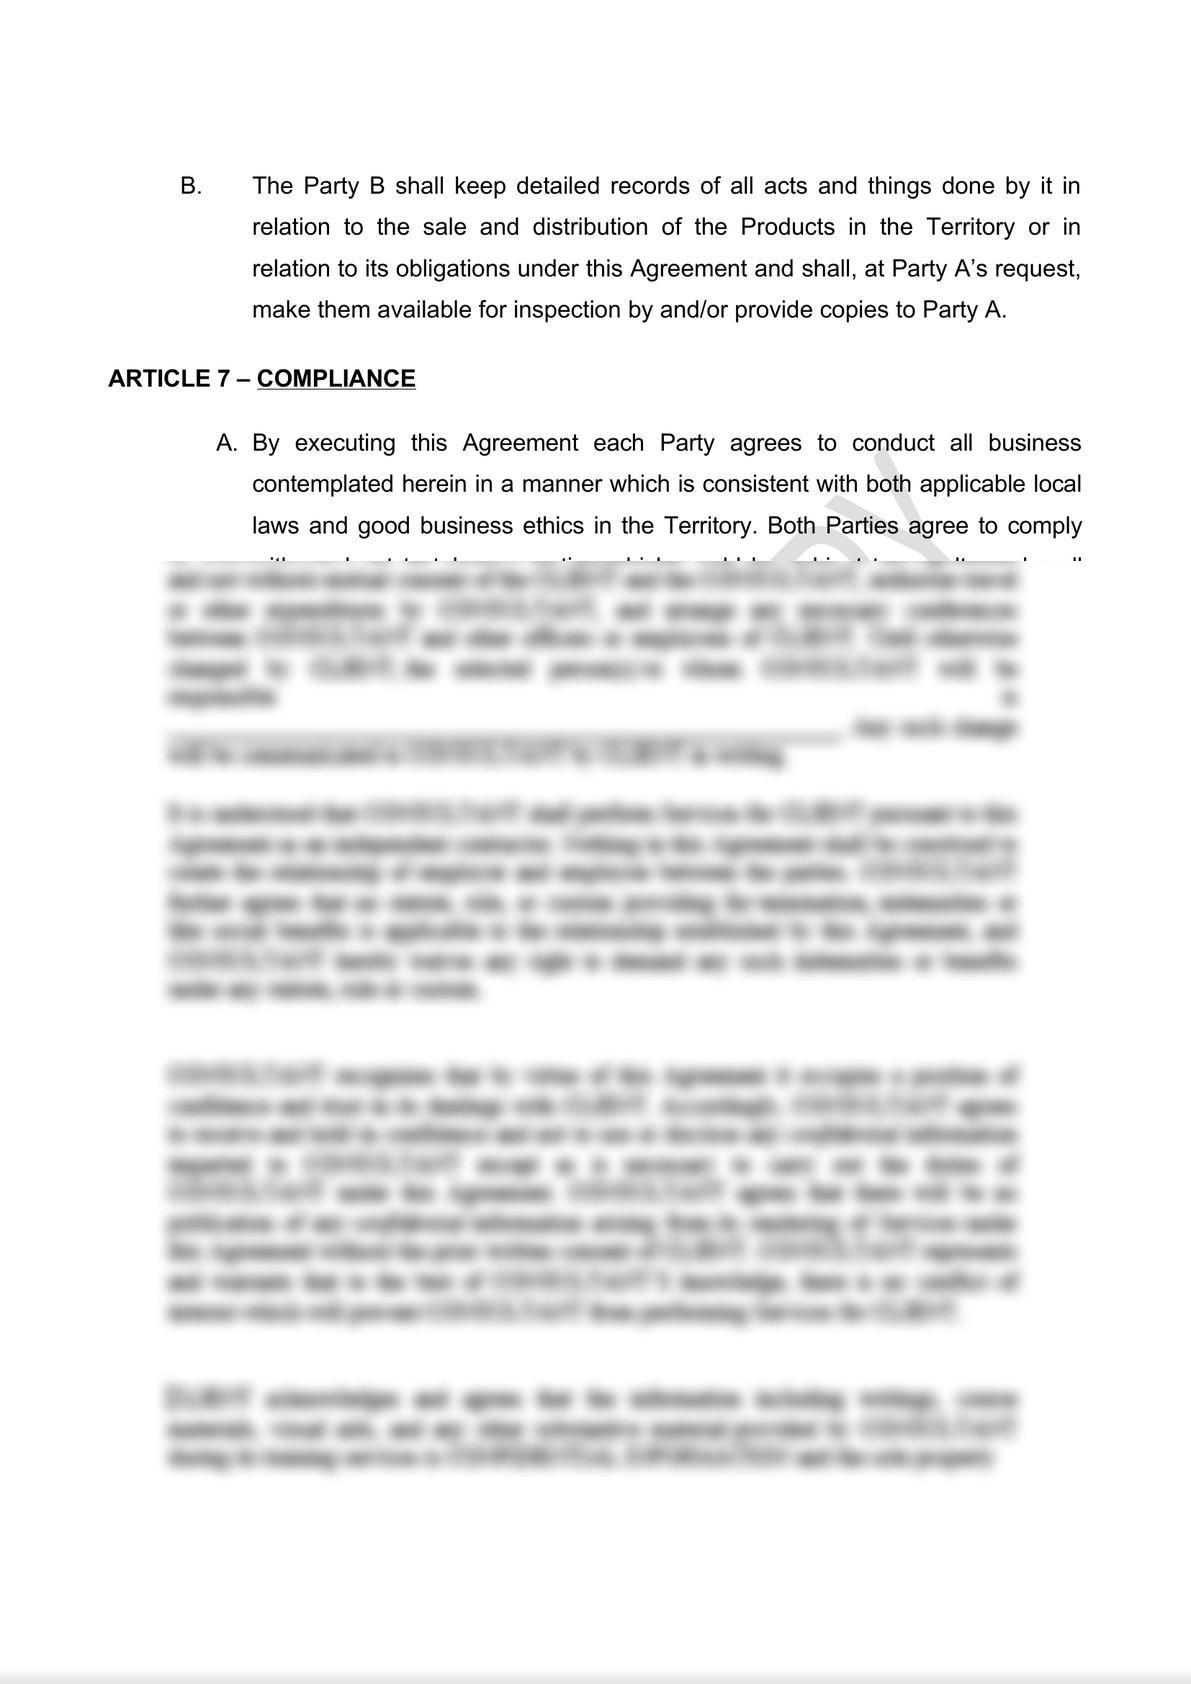 Distribution Agreement Draft (iii)-8